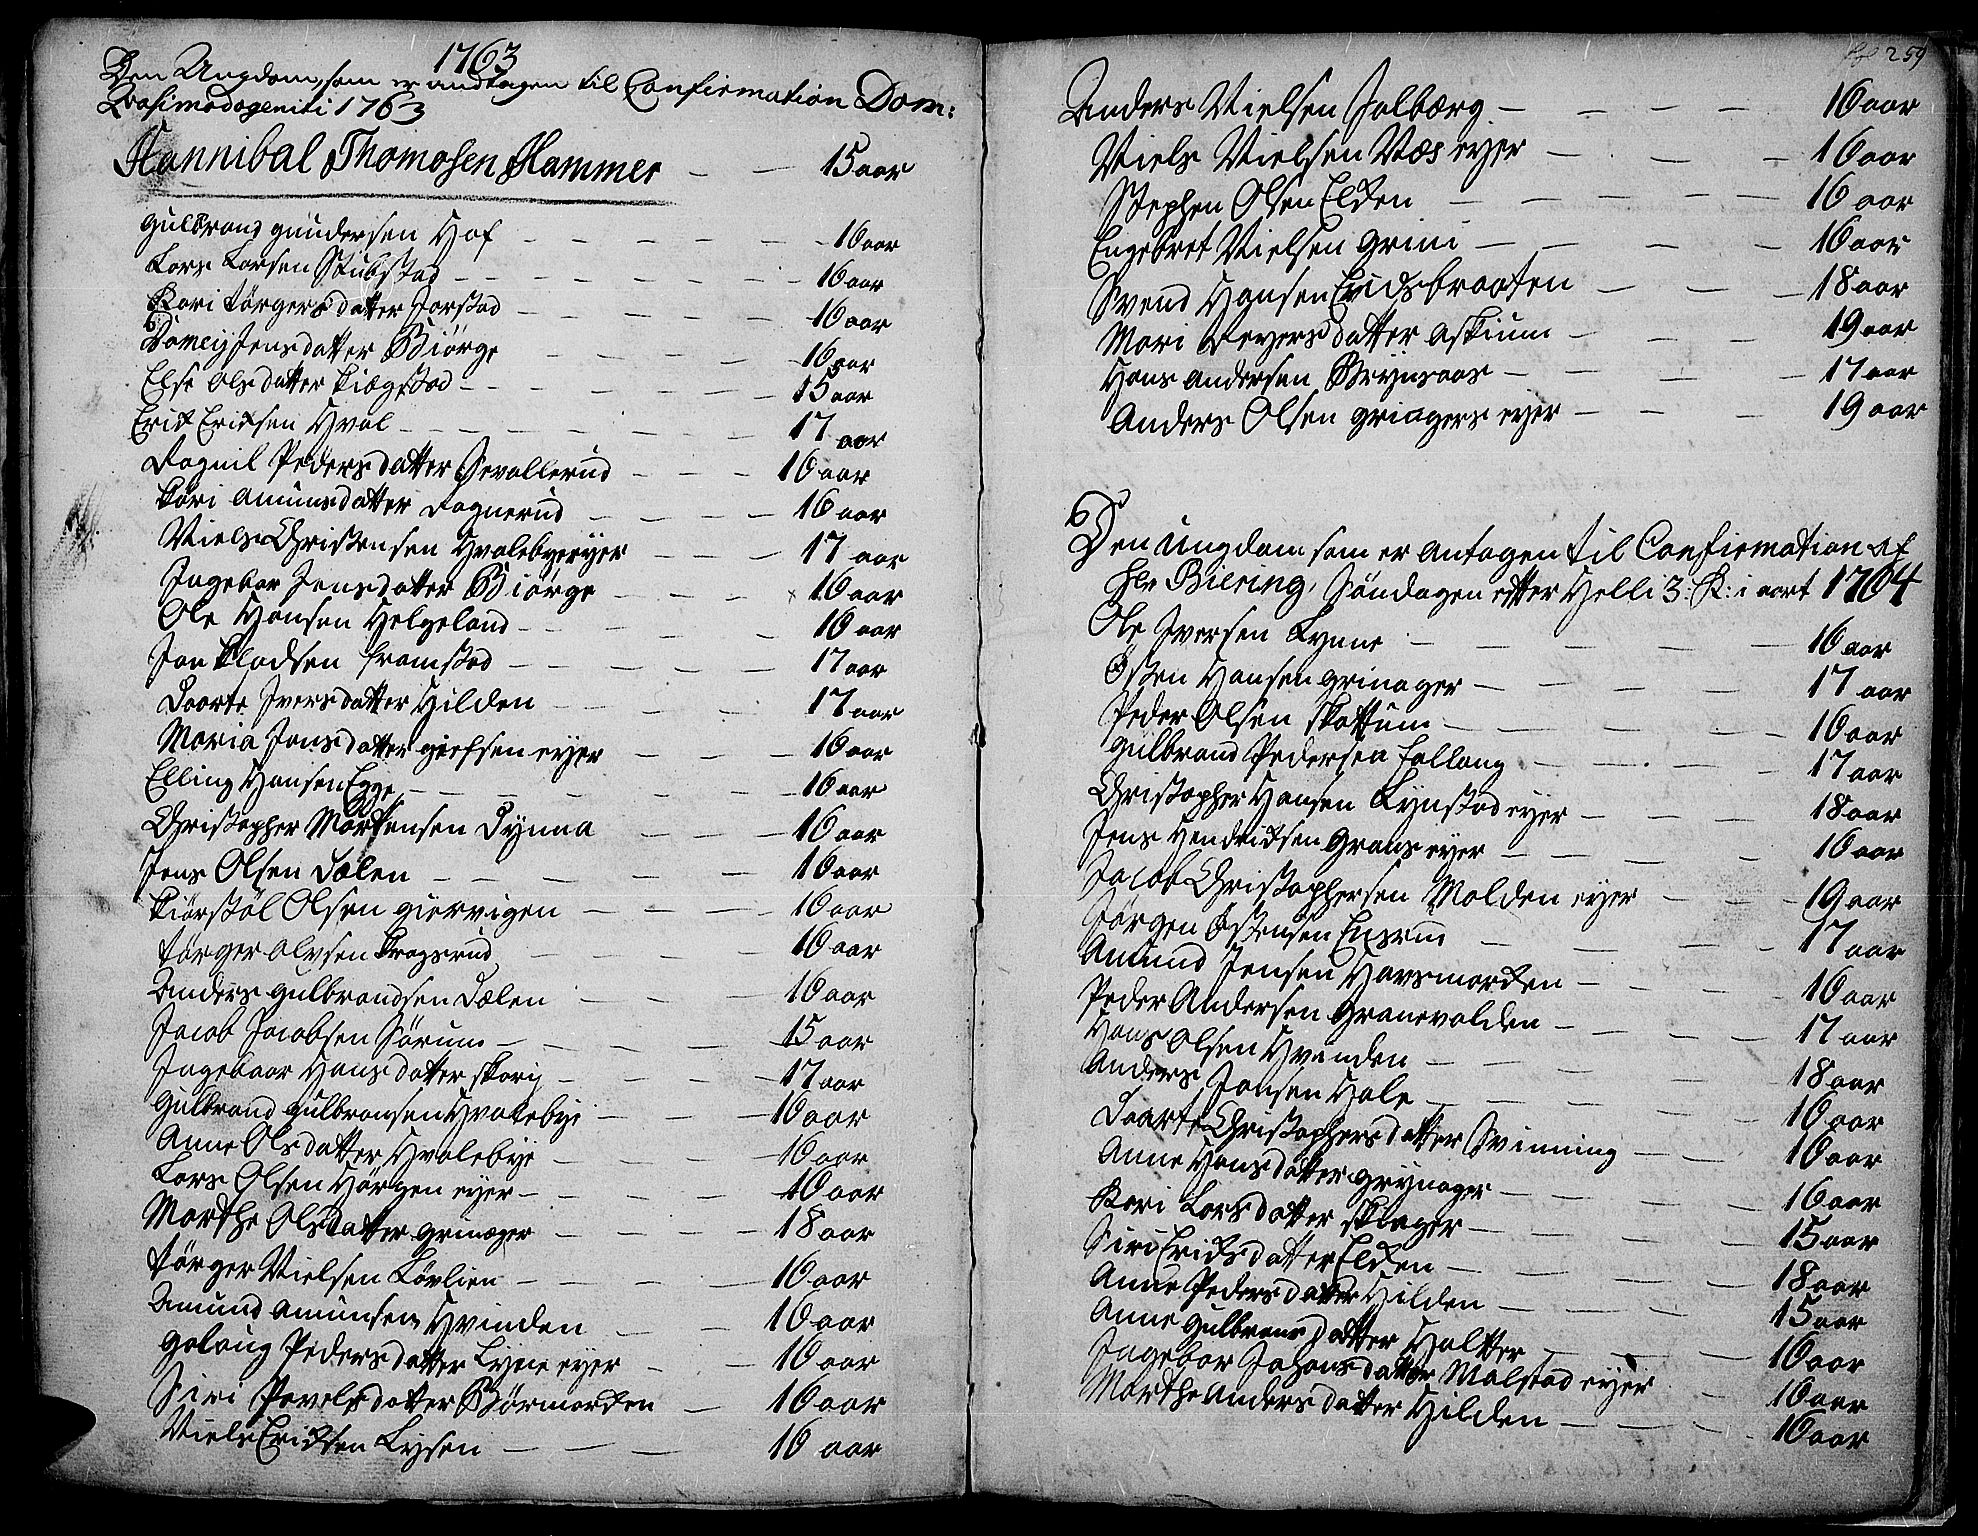 SAH, Gran prestekontor, Ministerialbok nr. 4, 1759-1775, s. 259